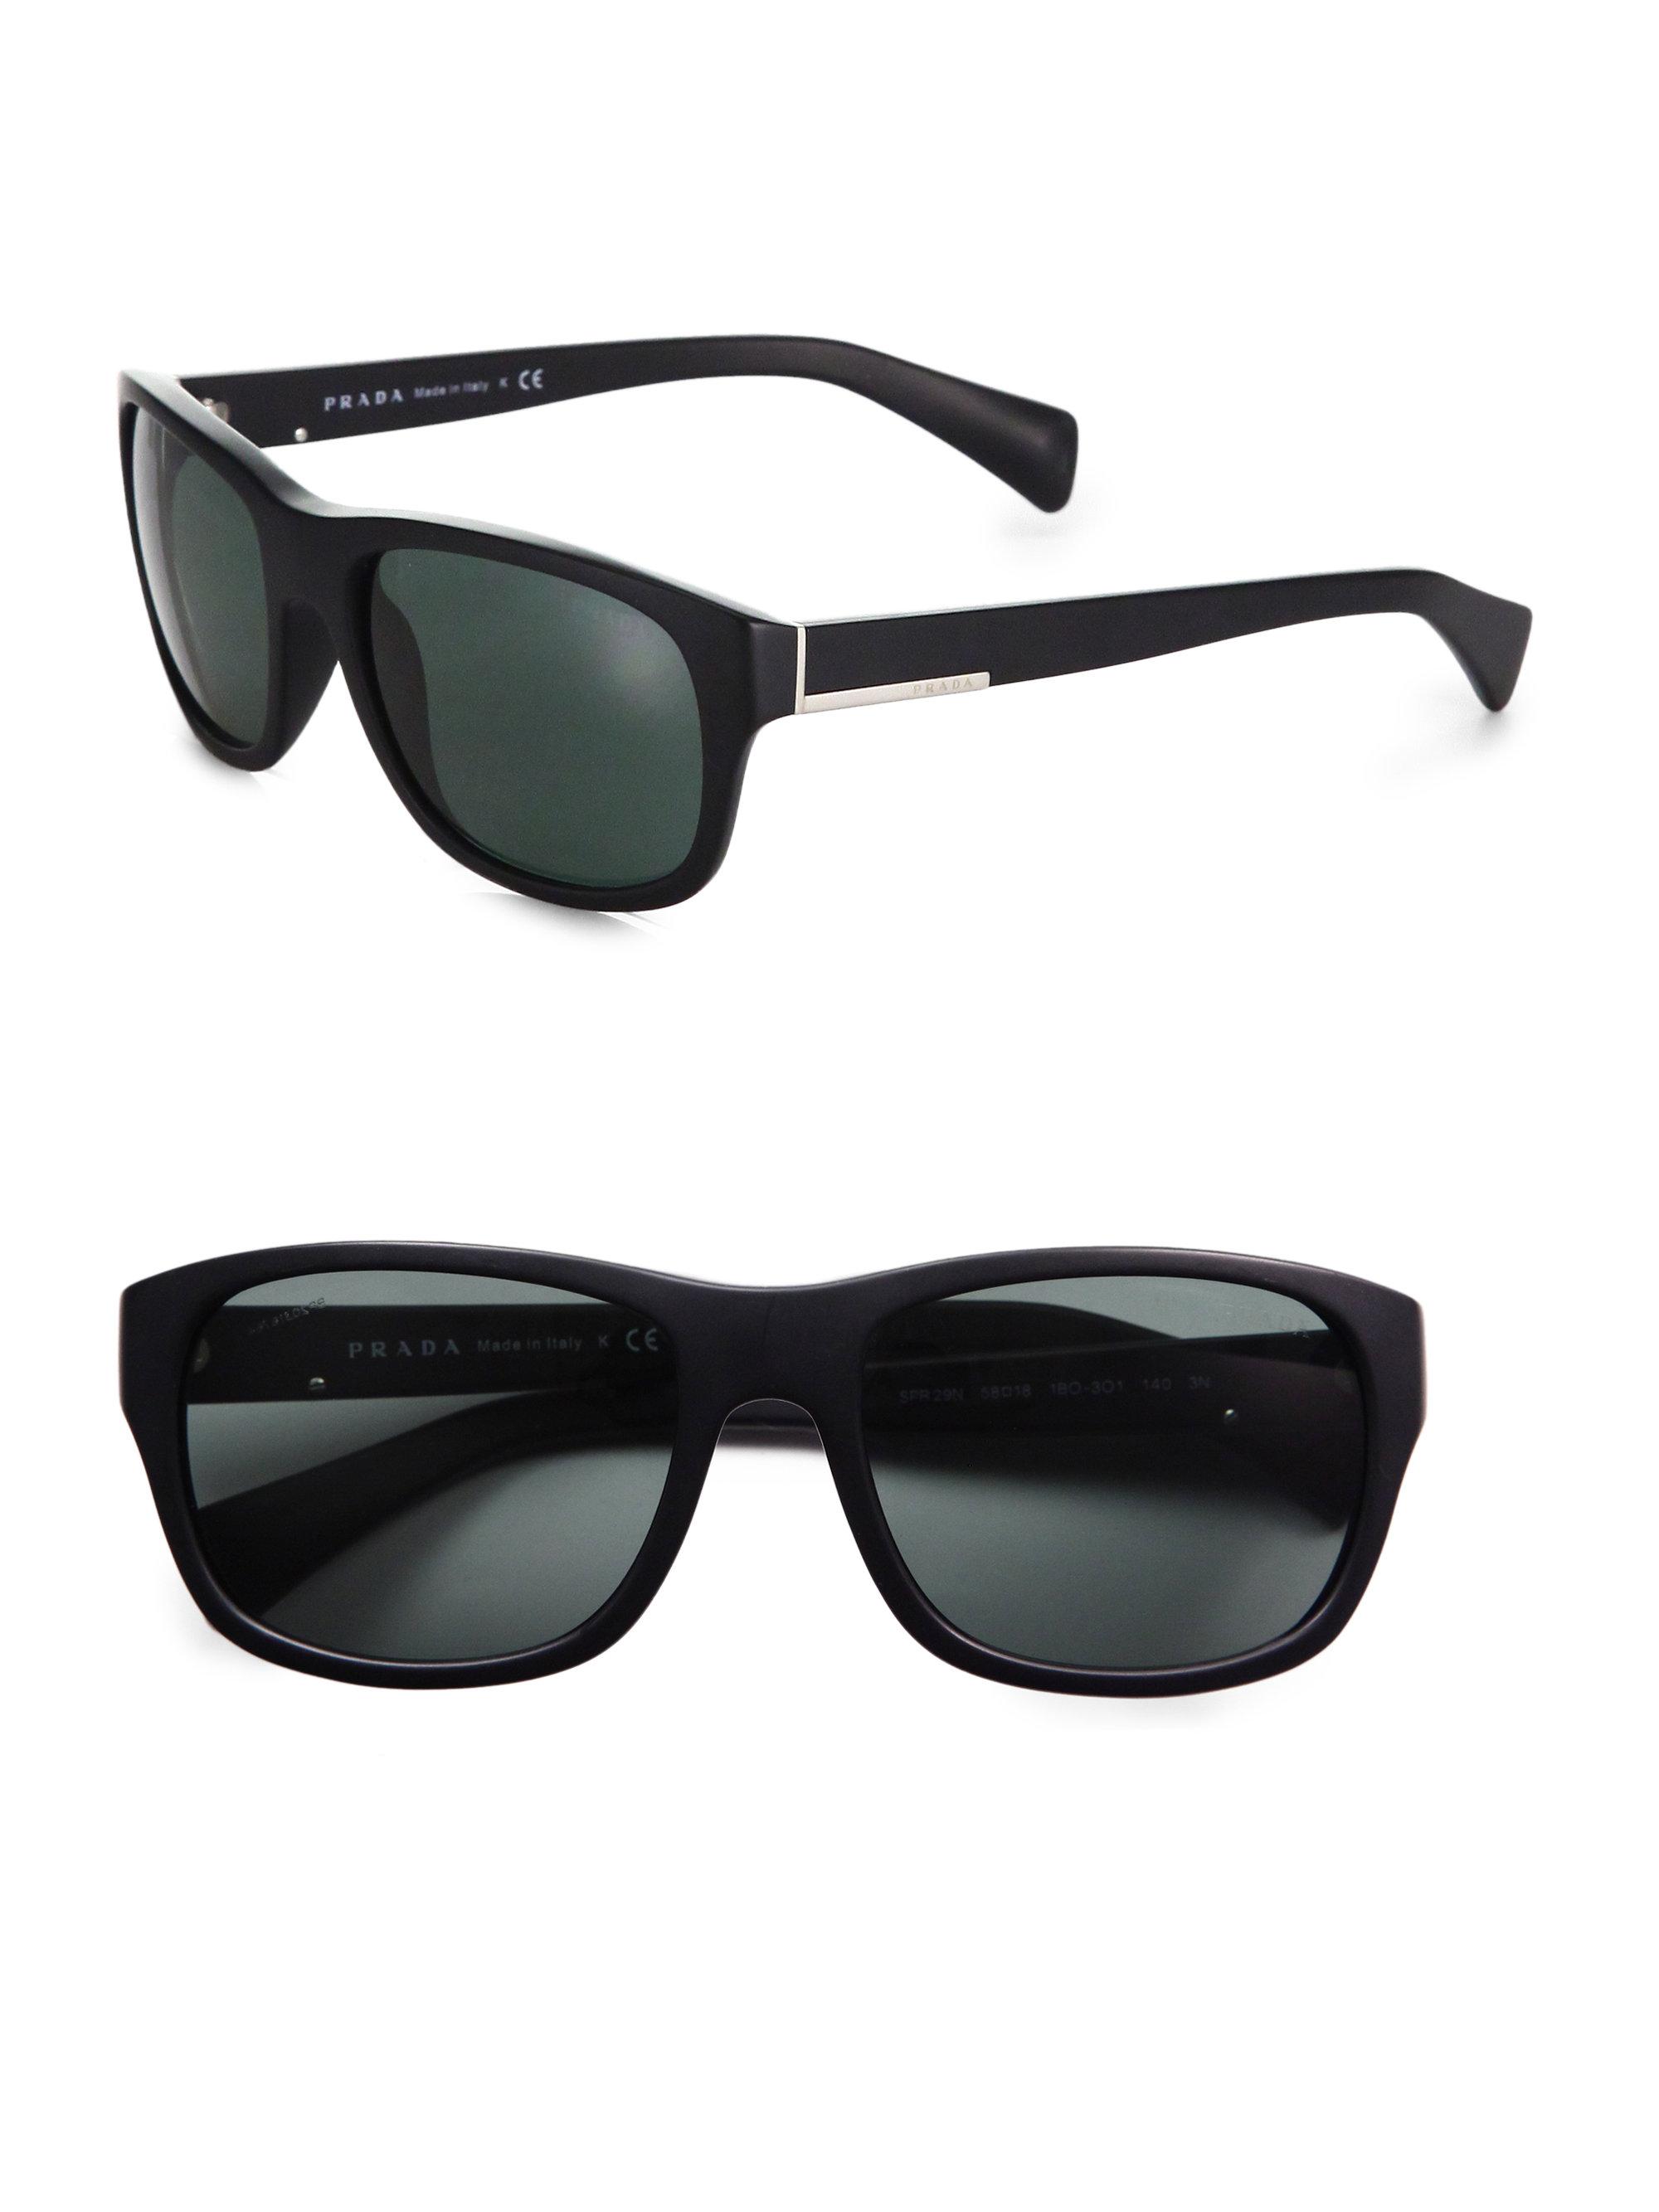 47a212146ad Lyst - Prada Classic Acetate Sunglasses in Black for Men